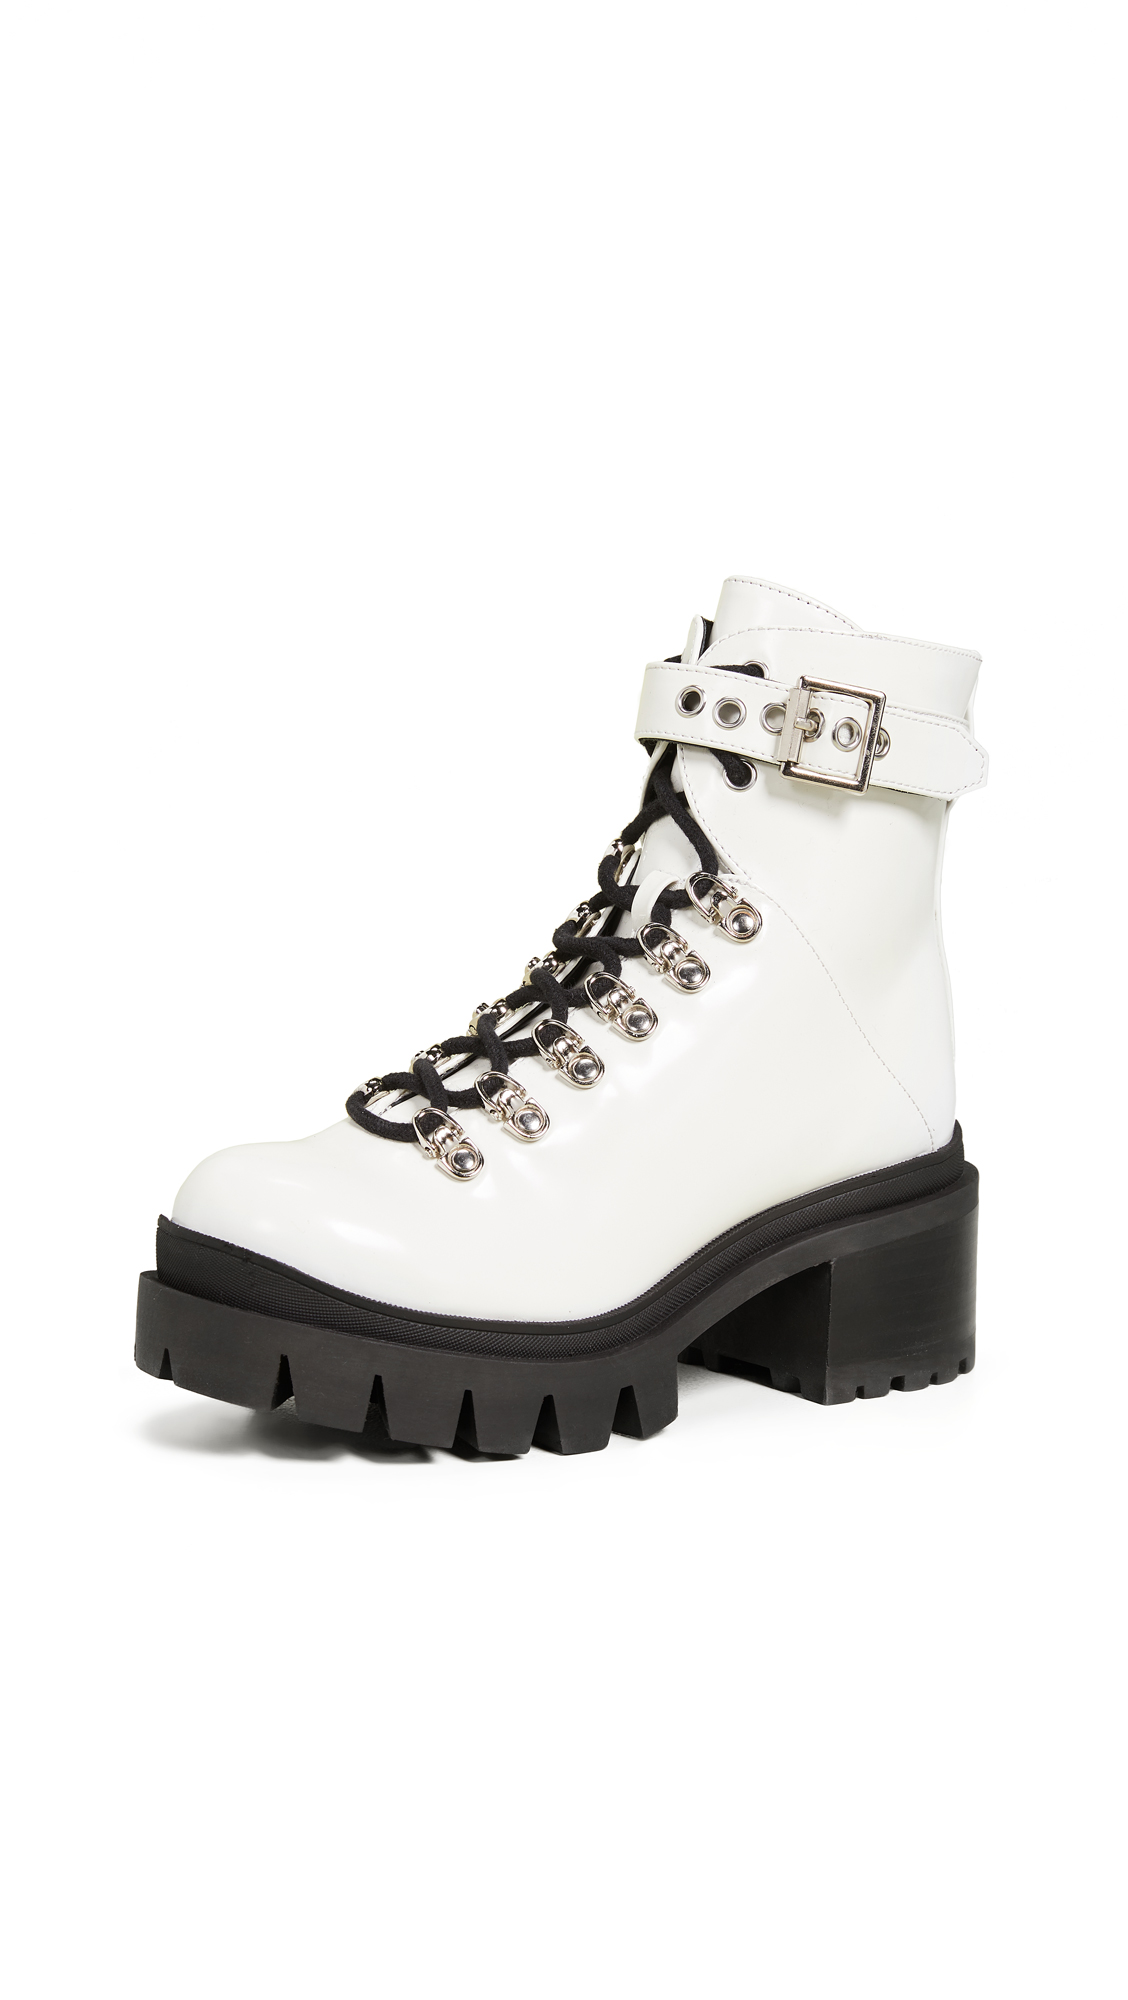 Jeffrey Campbell Czech Combat Boots - White